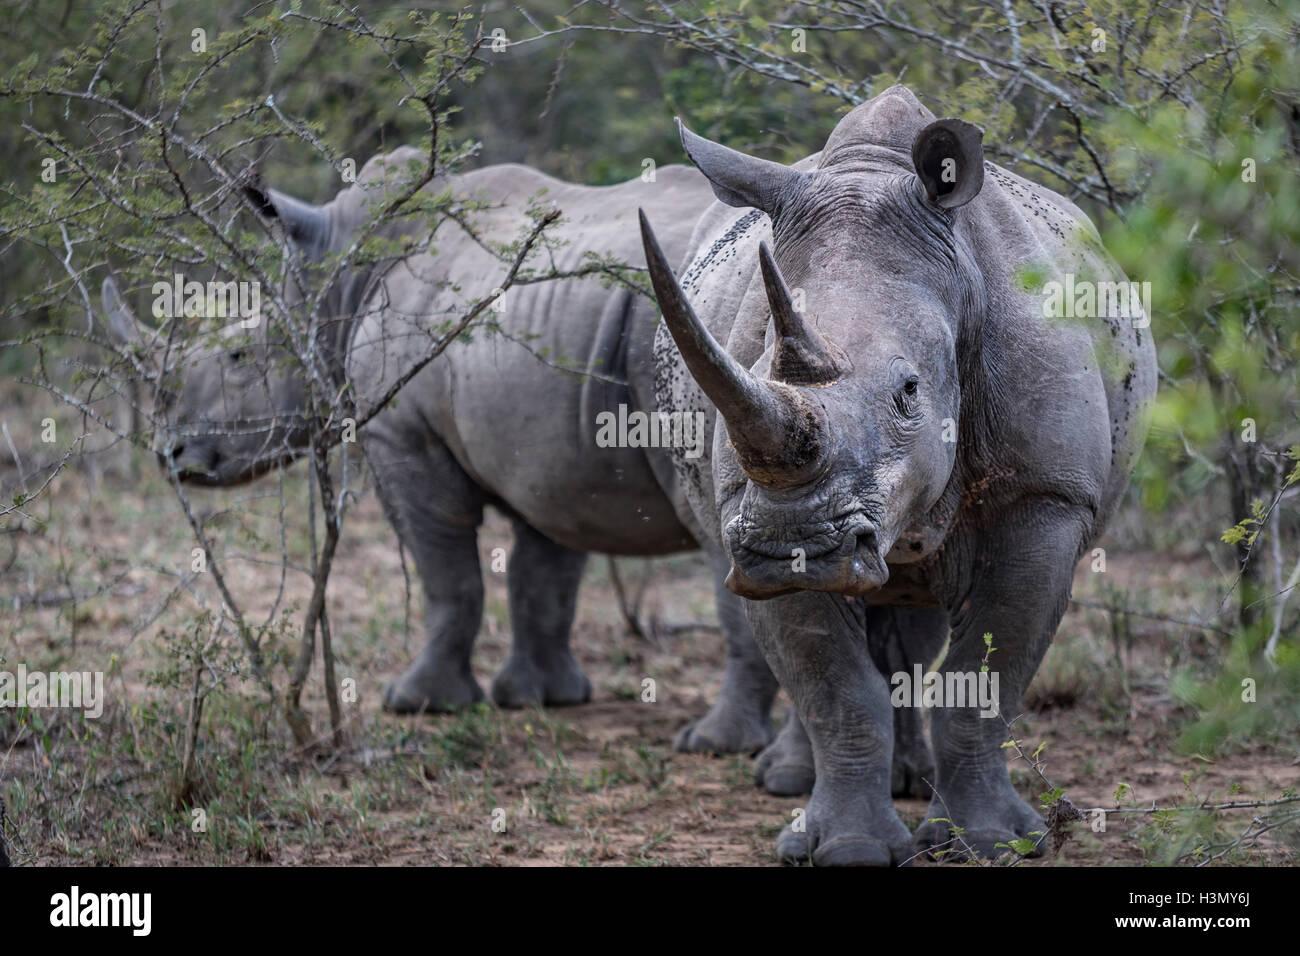 Endangered White Rhino and calf, Hluhluwe-Imfolozi Park, South Africa Stock Photo